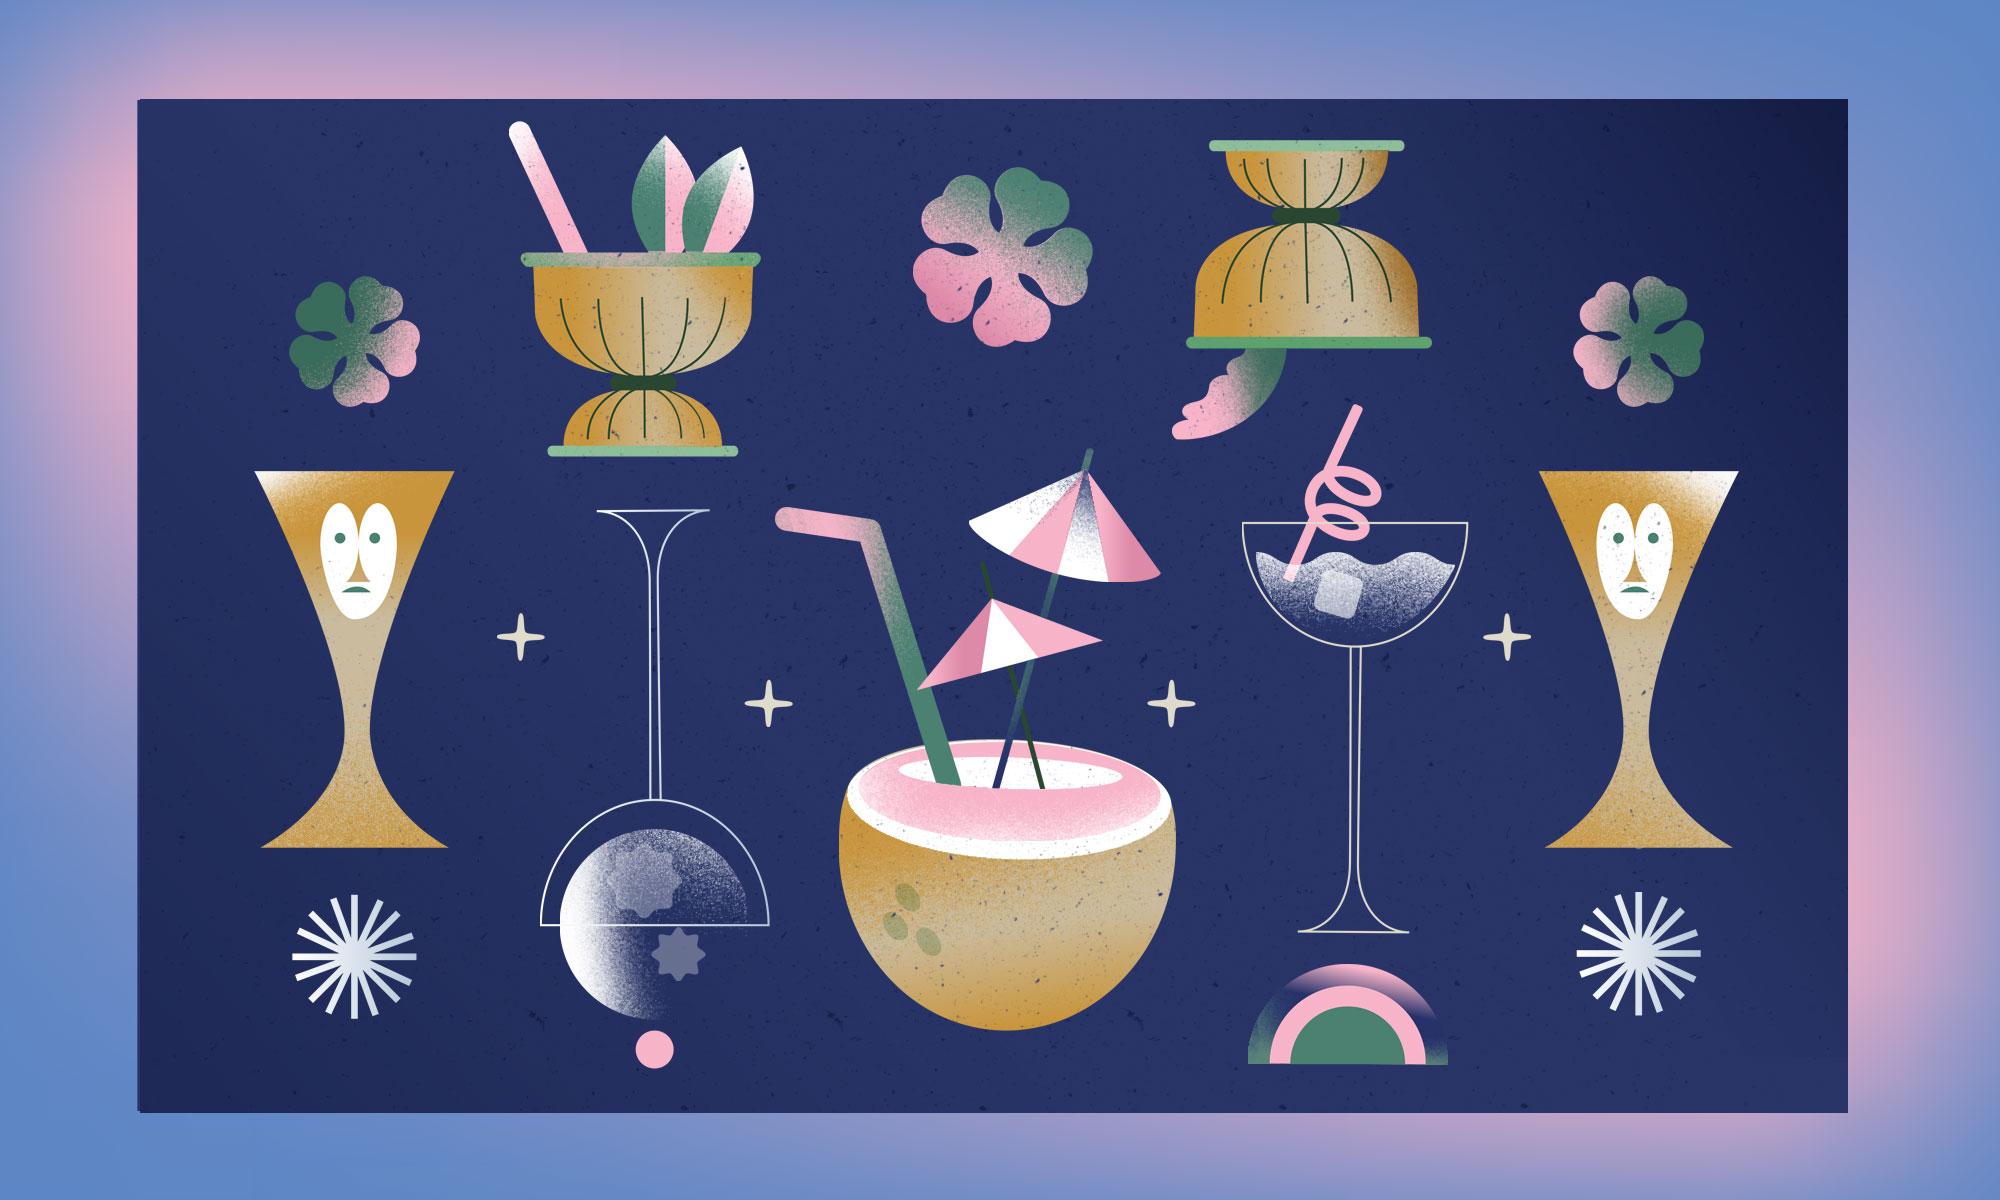 Tiki drinkware in various shapes.